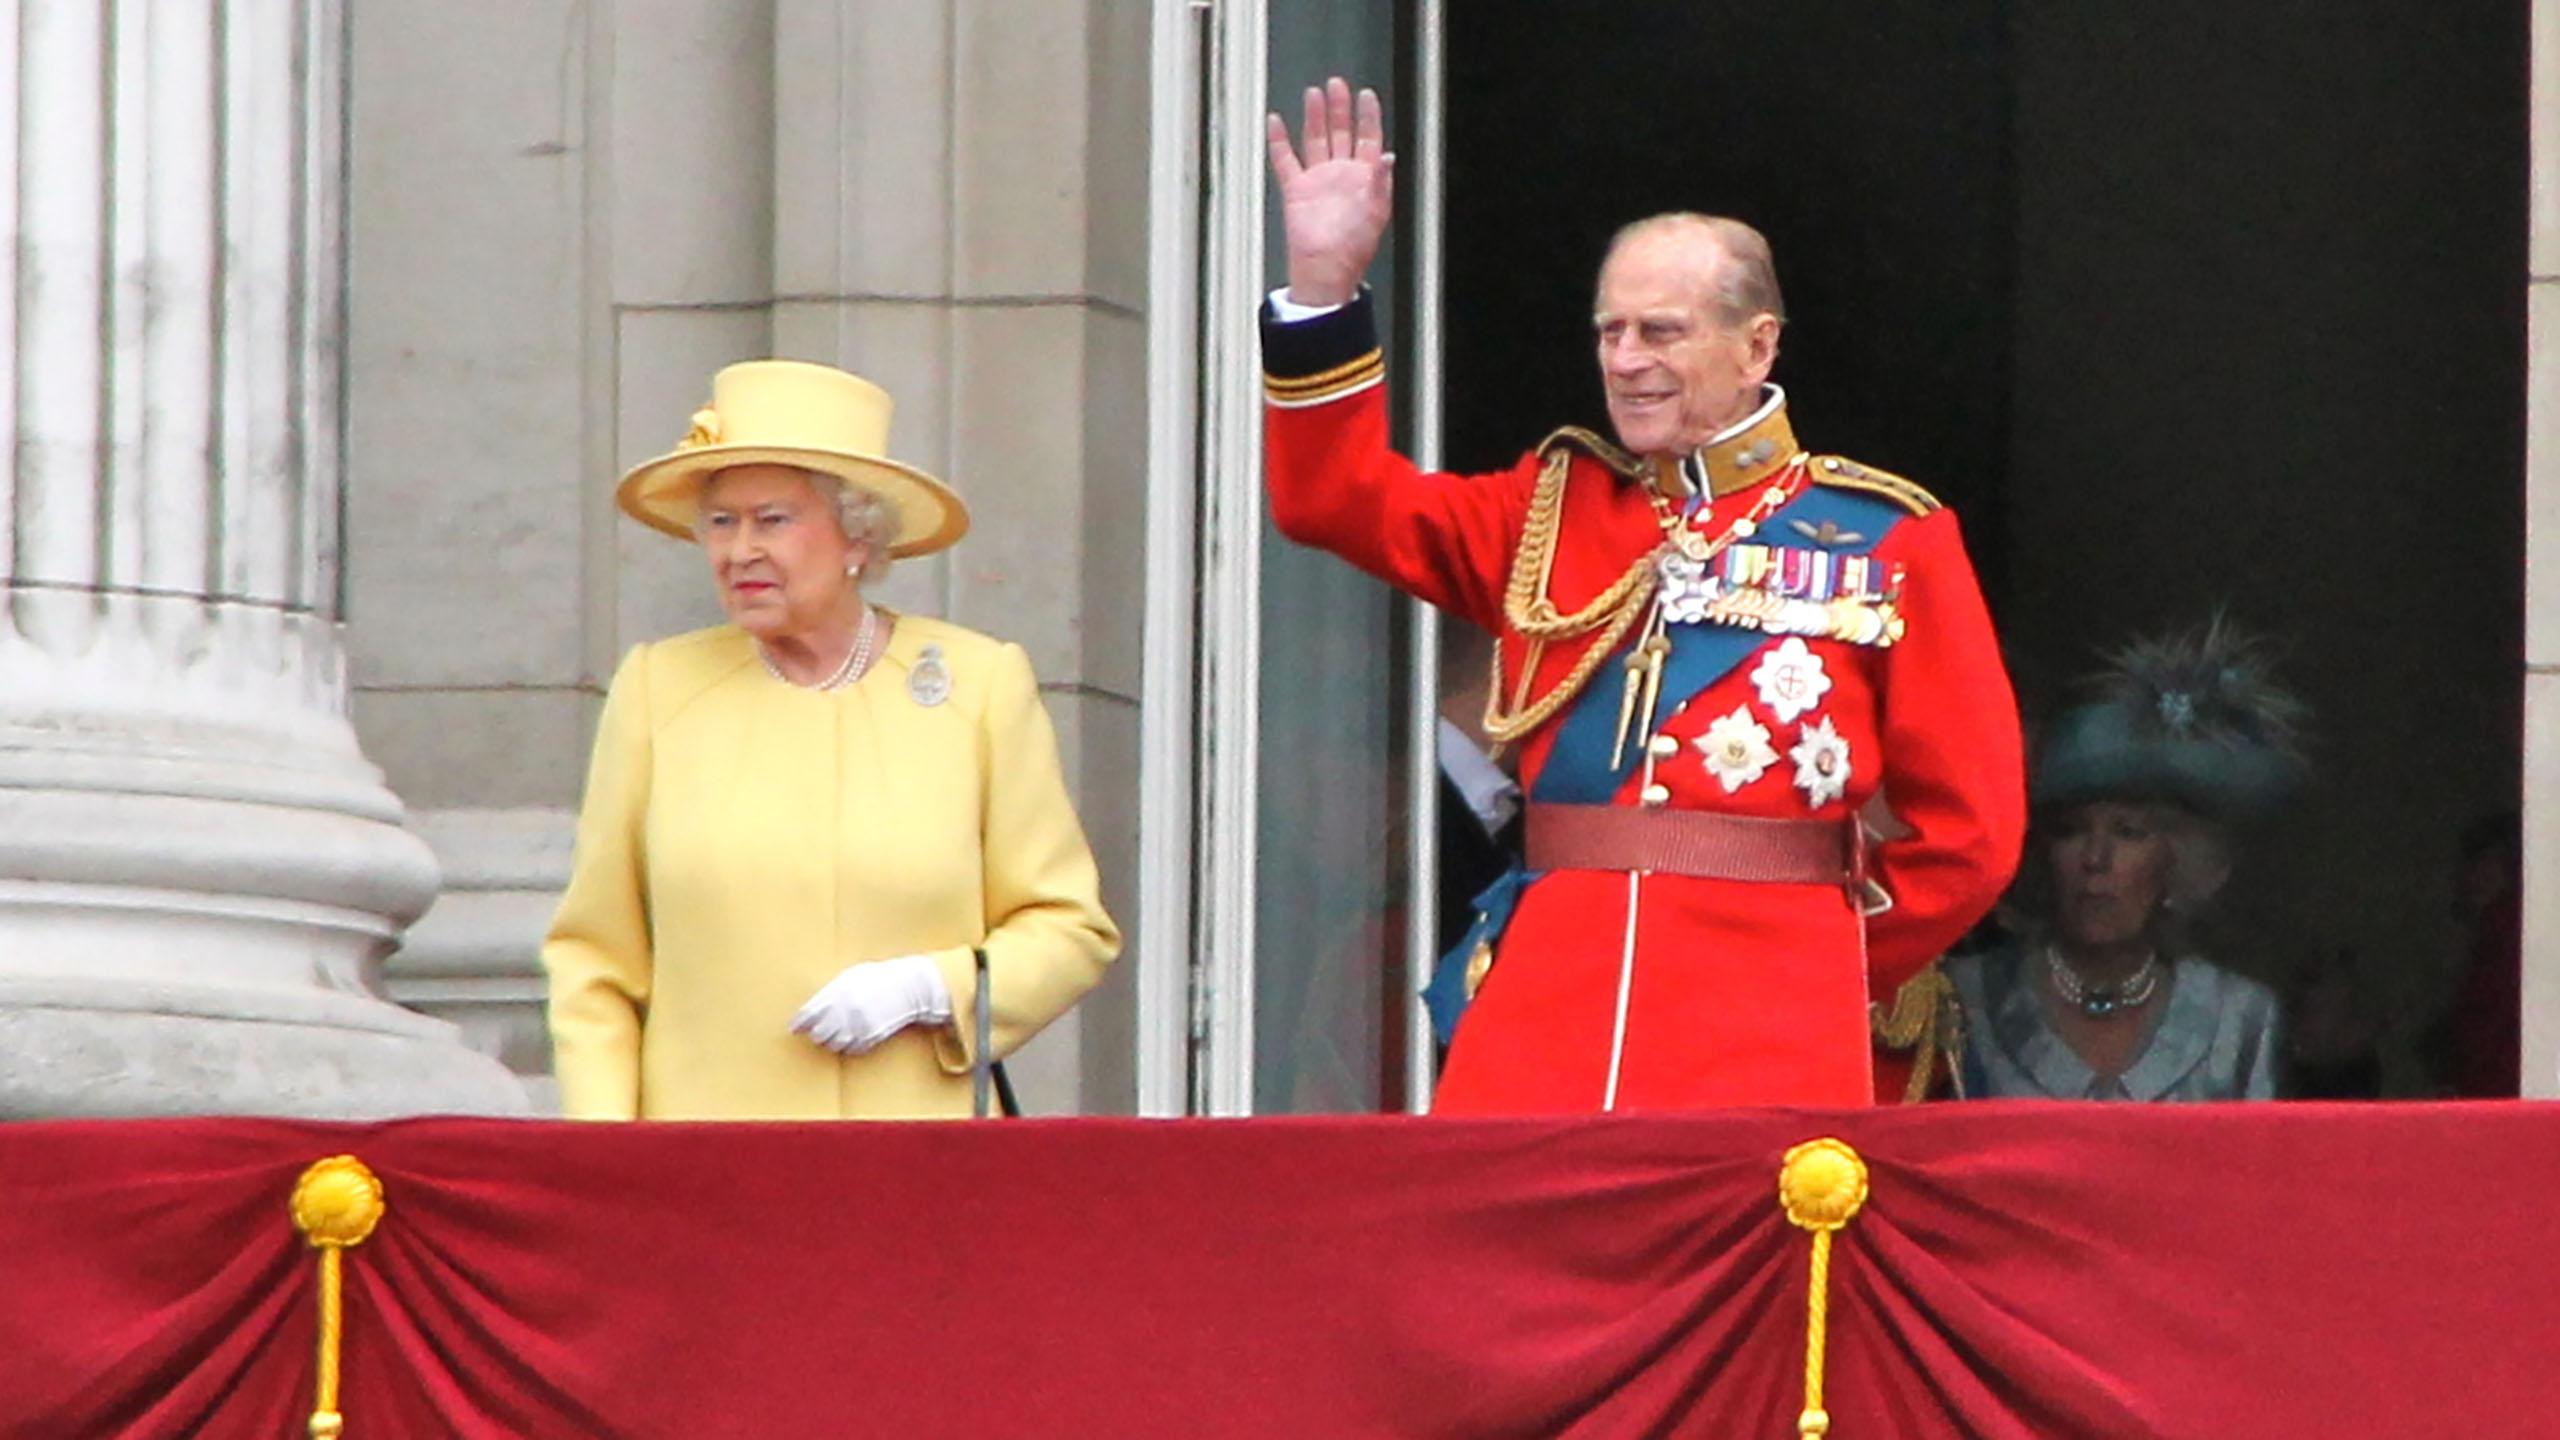 Príncipe Felipe, muerte, realeza